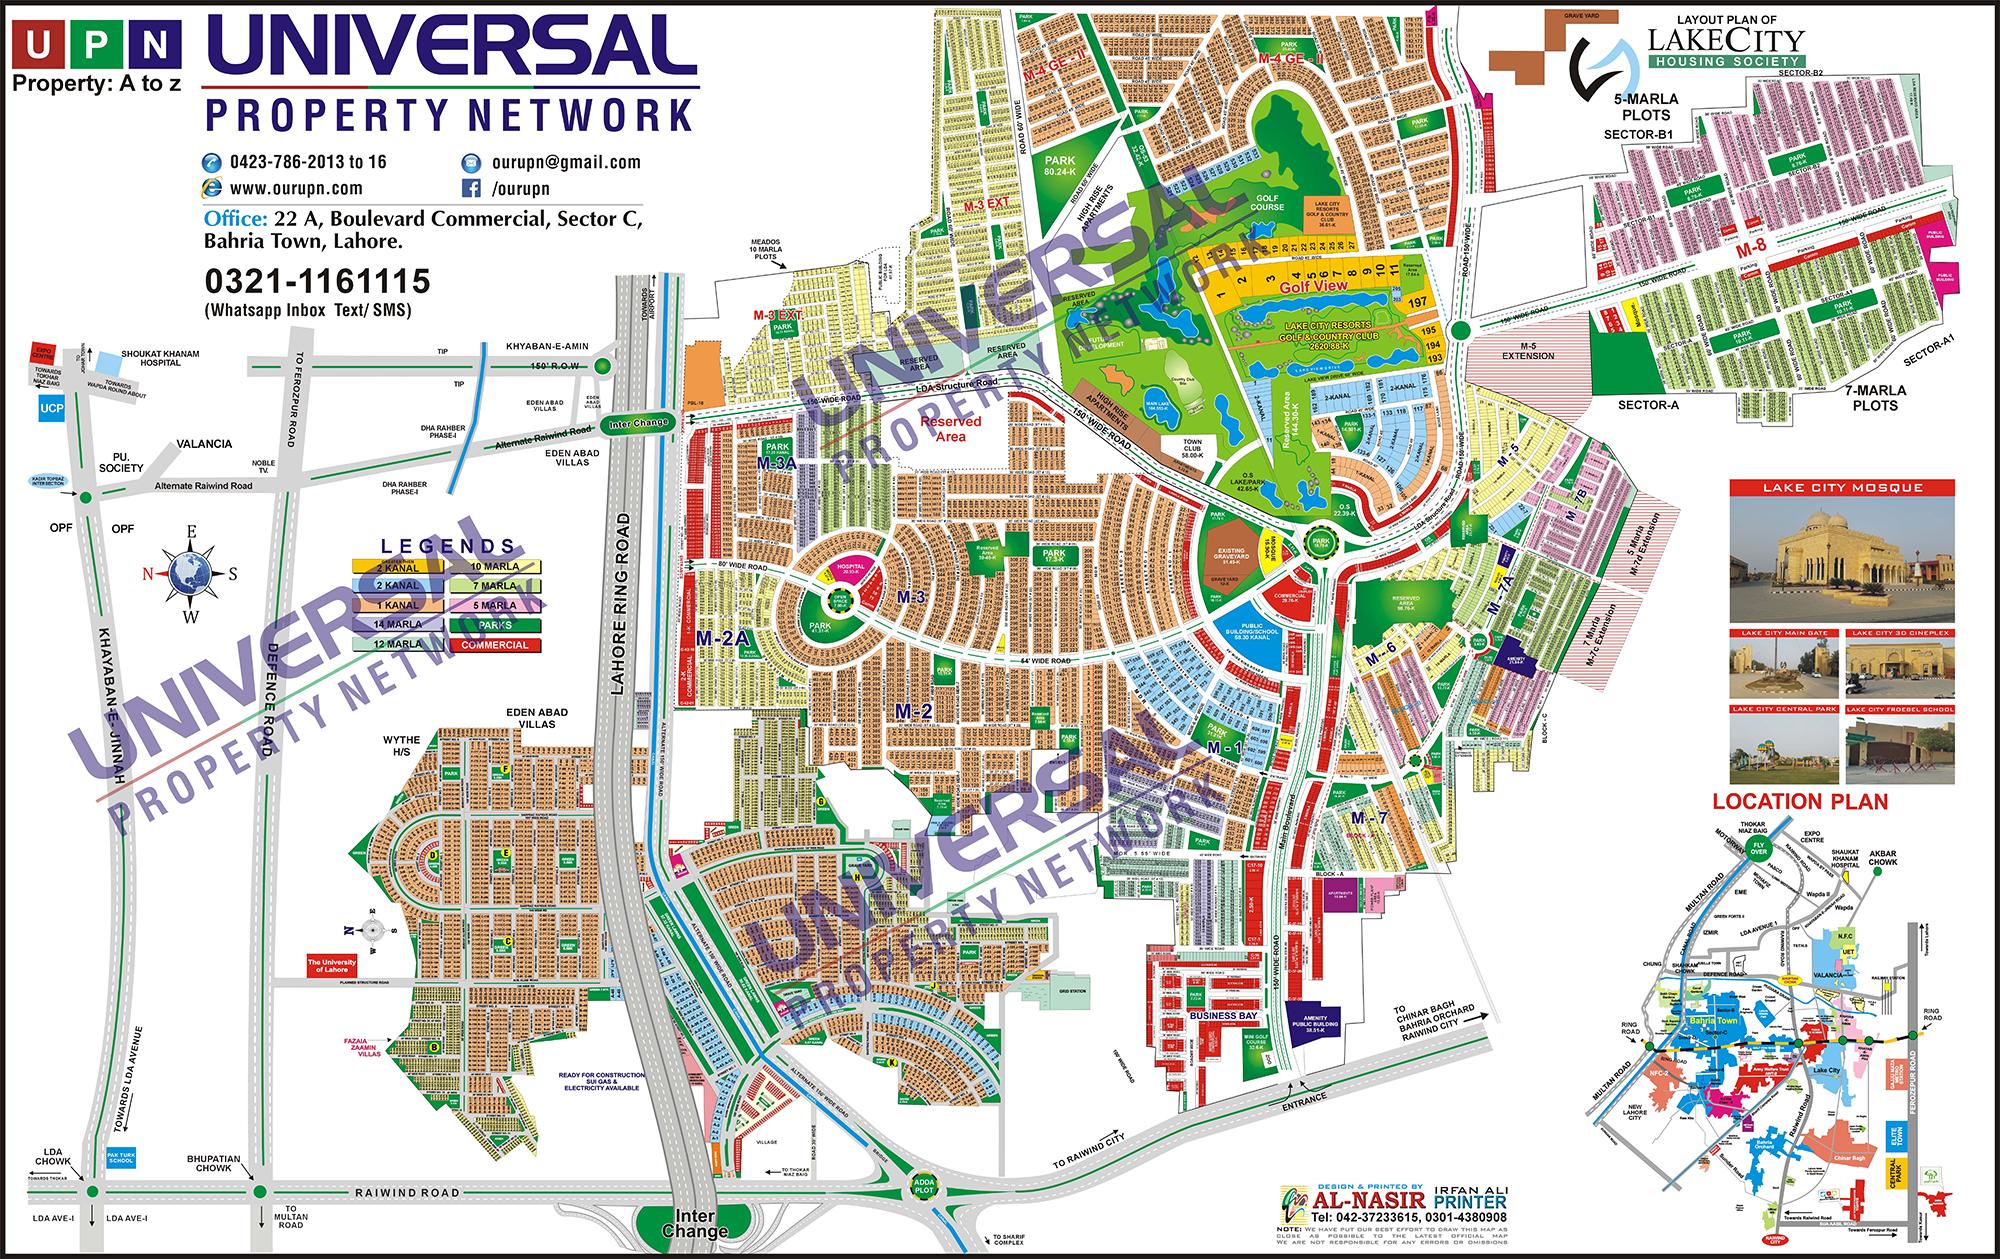 Lake City Map Lahore Real Estate Maps Lake City Lahore Map Map Lake City